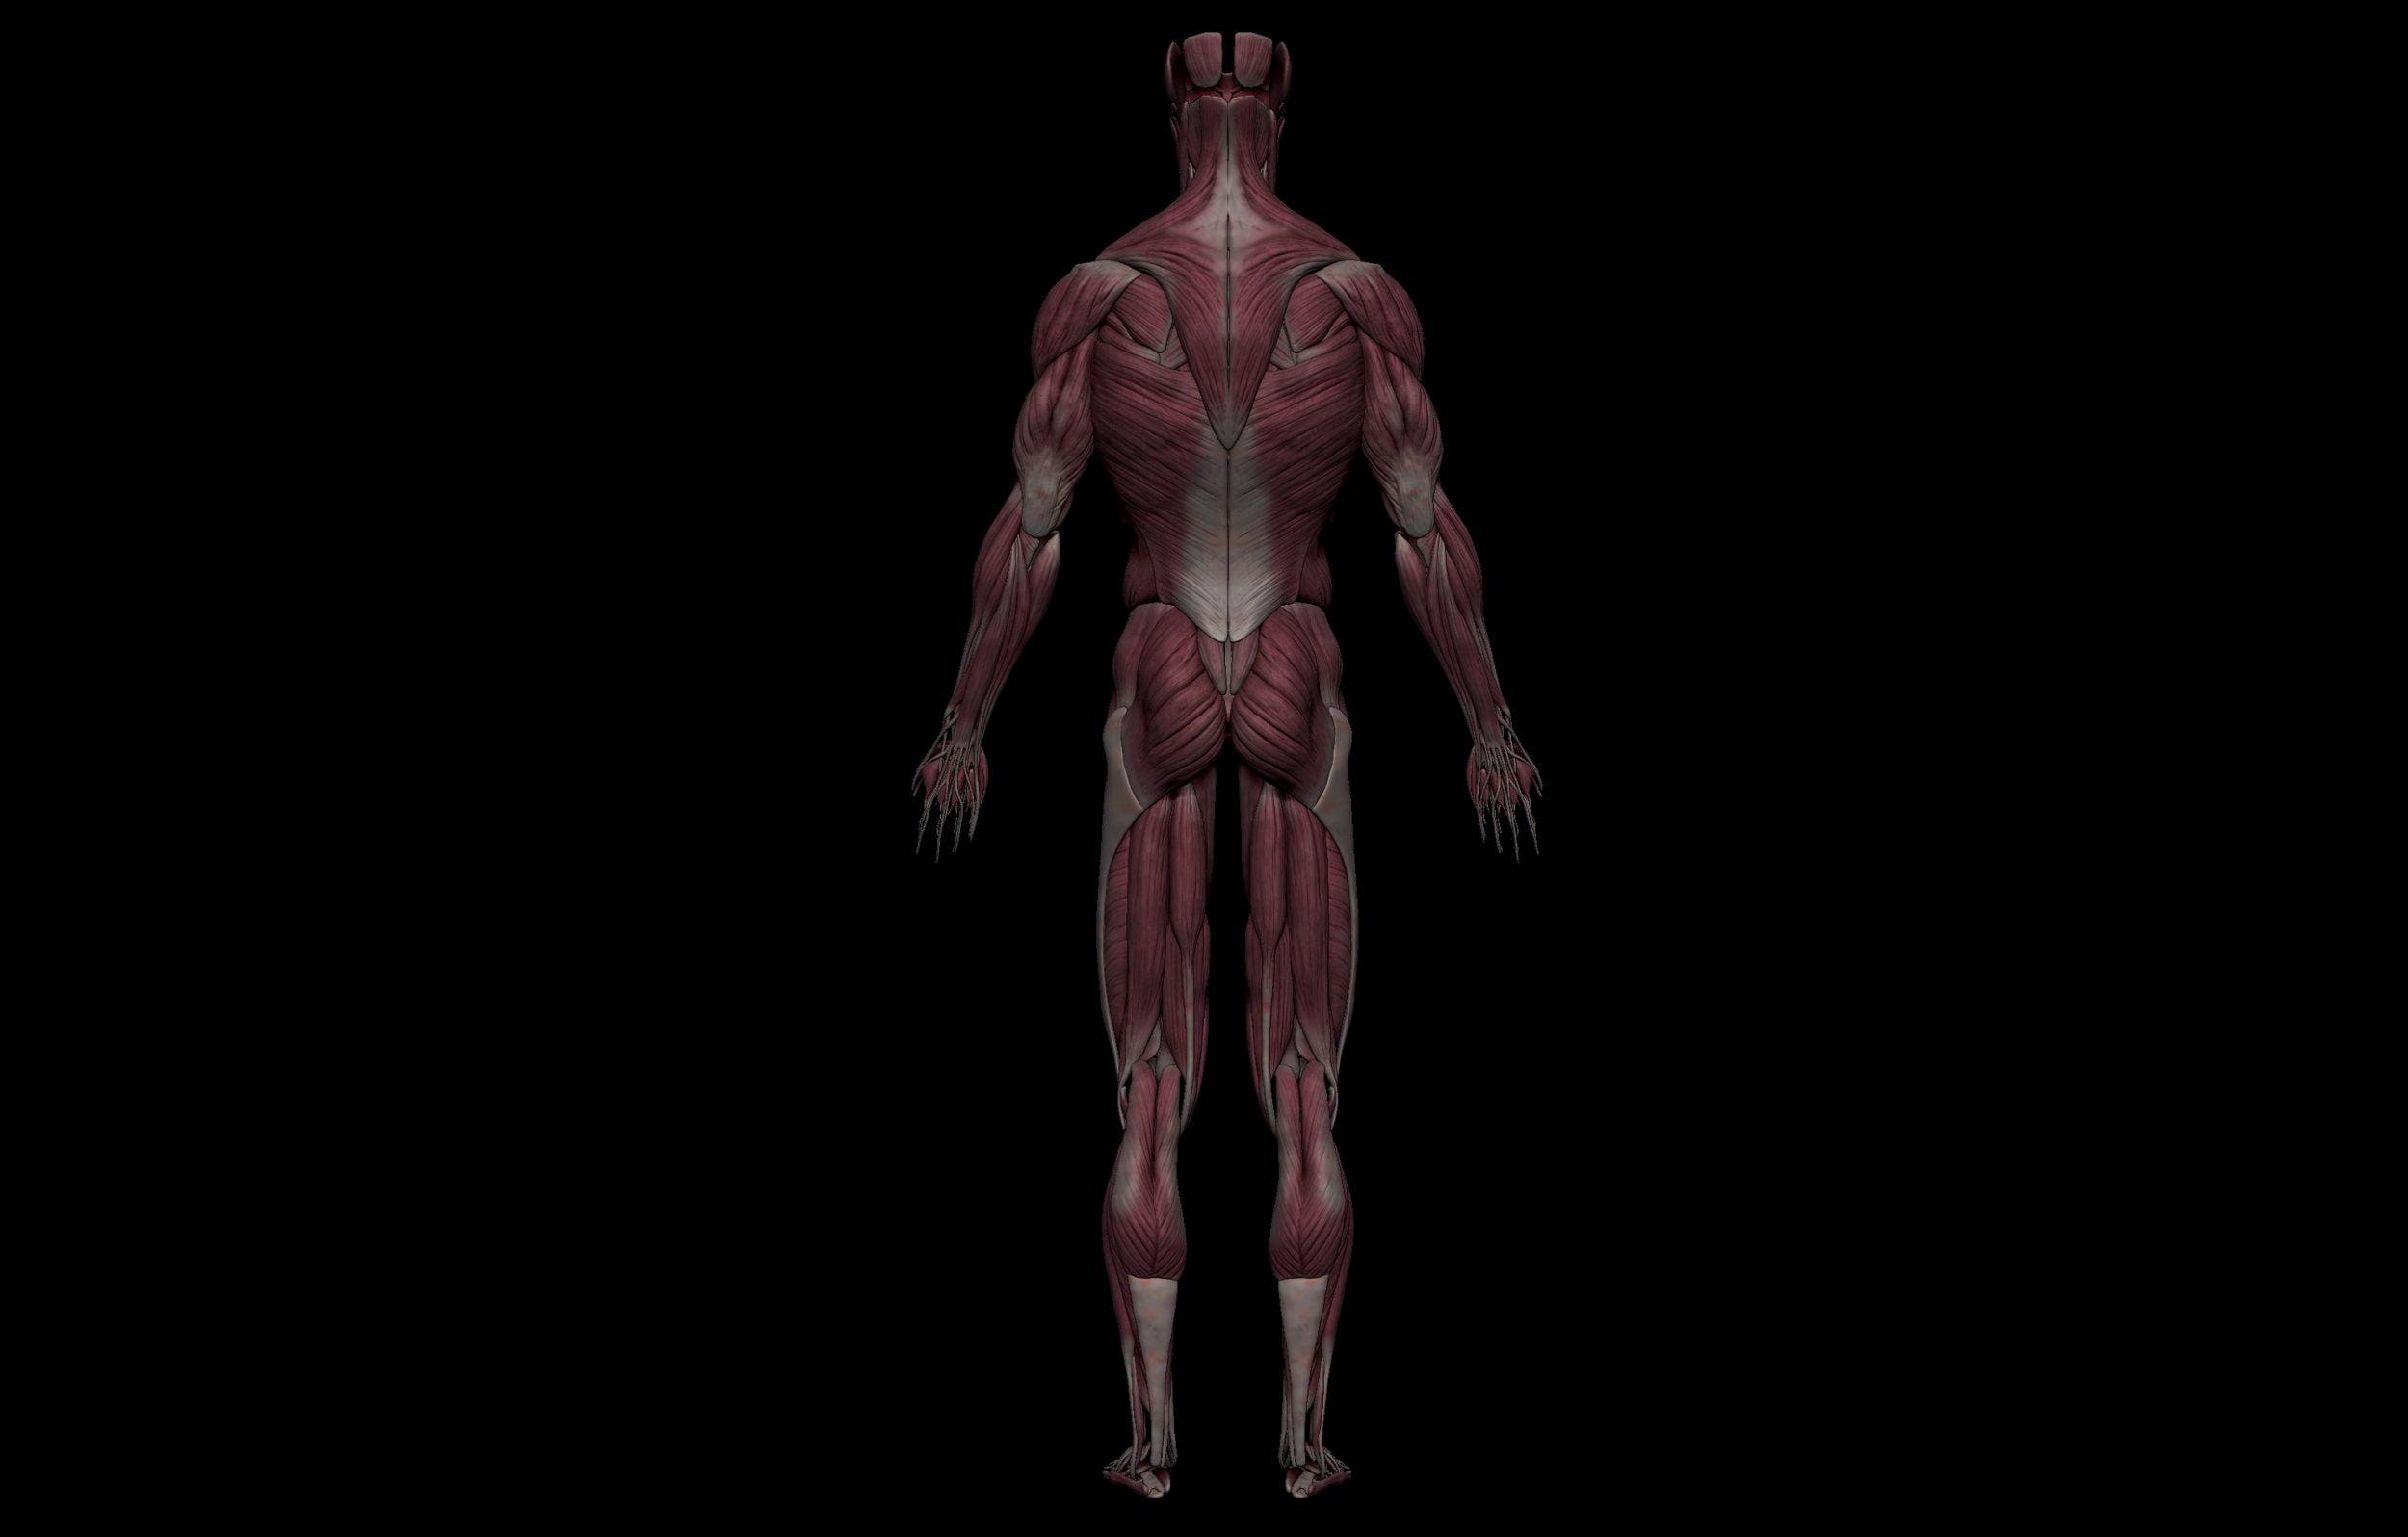 5 3 scaled SA Anatomy   Study Anatomy in 3D